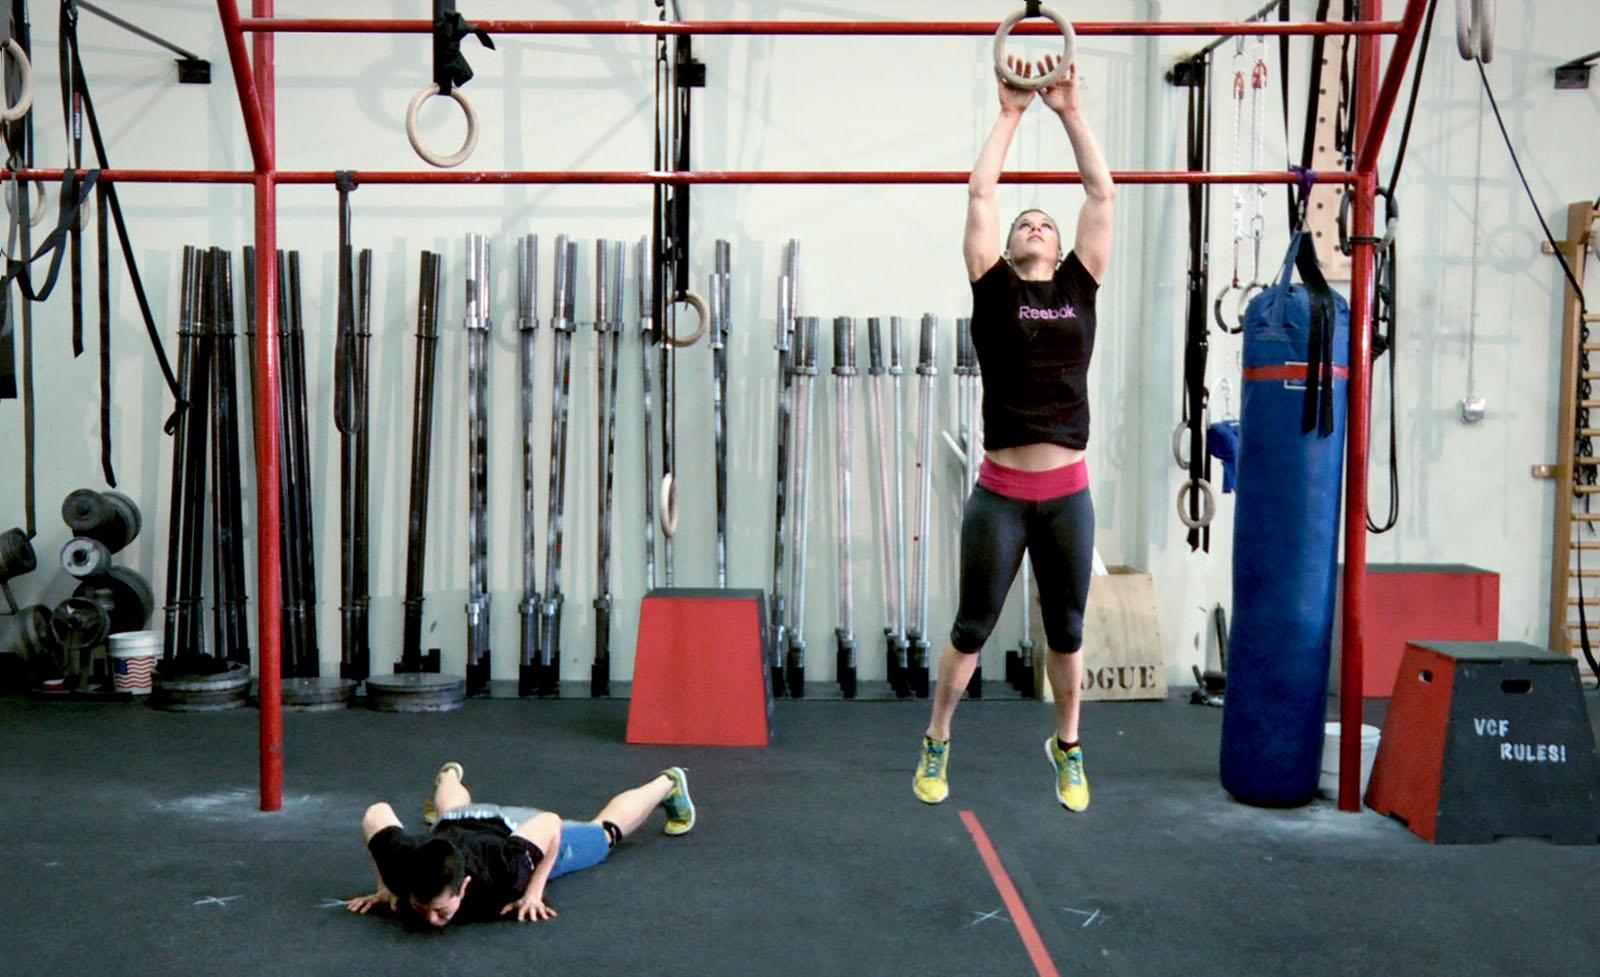 Crossfit Training Burpee